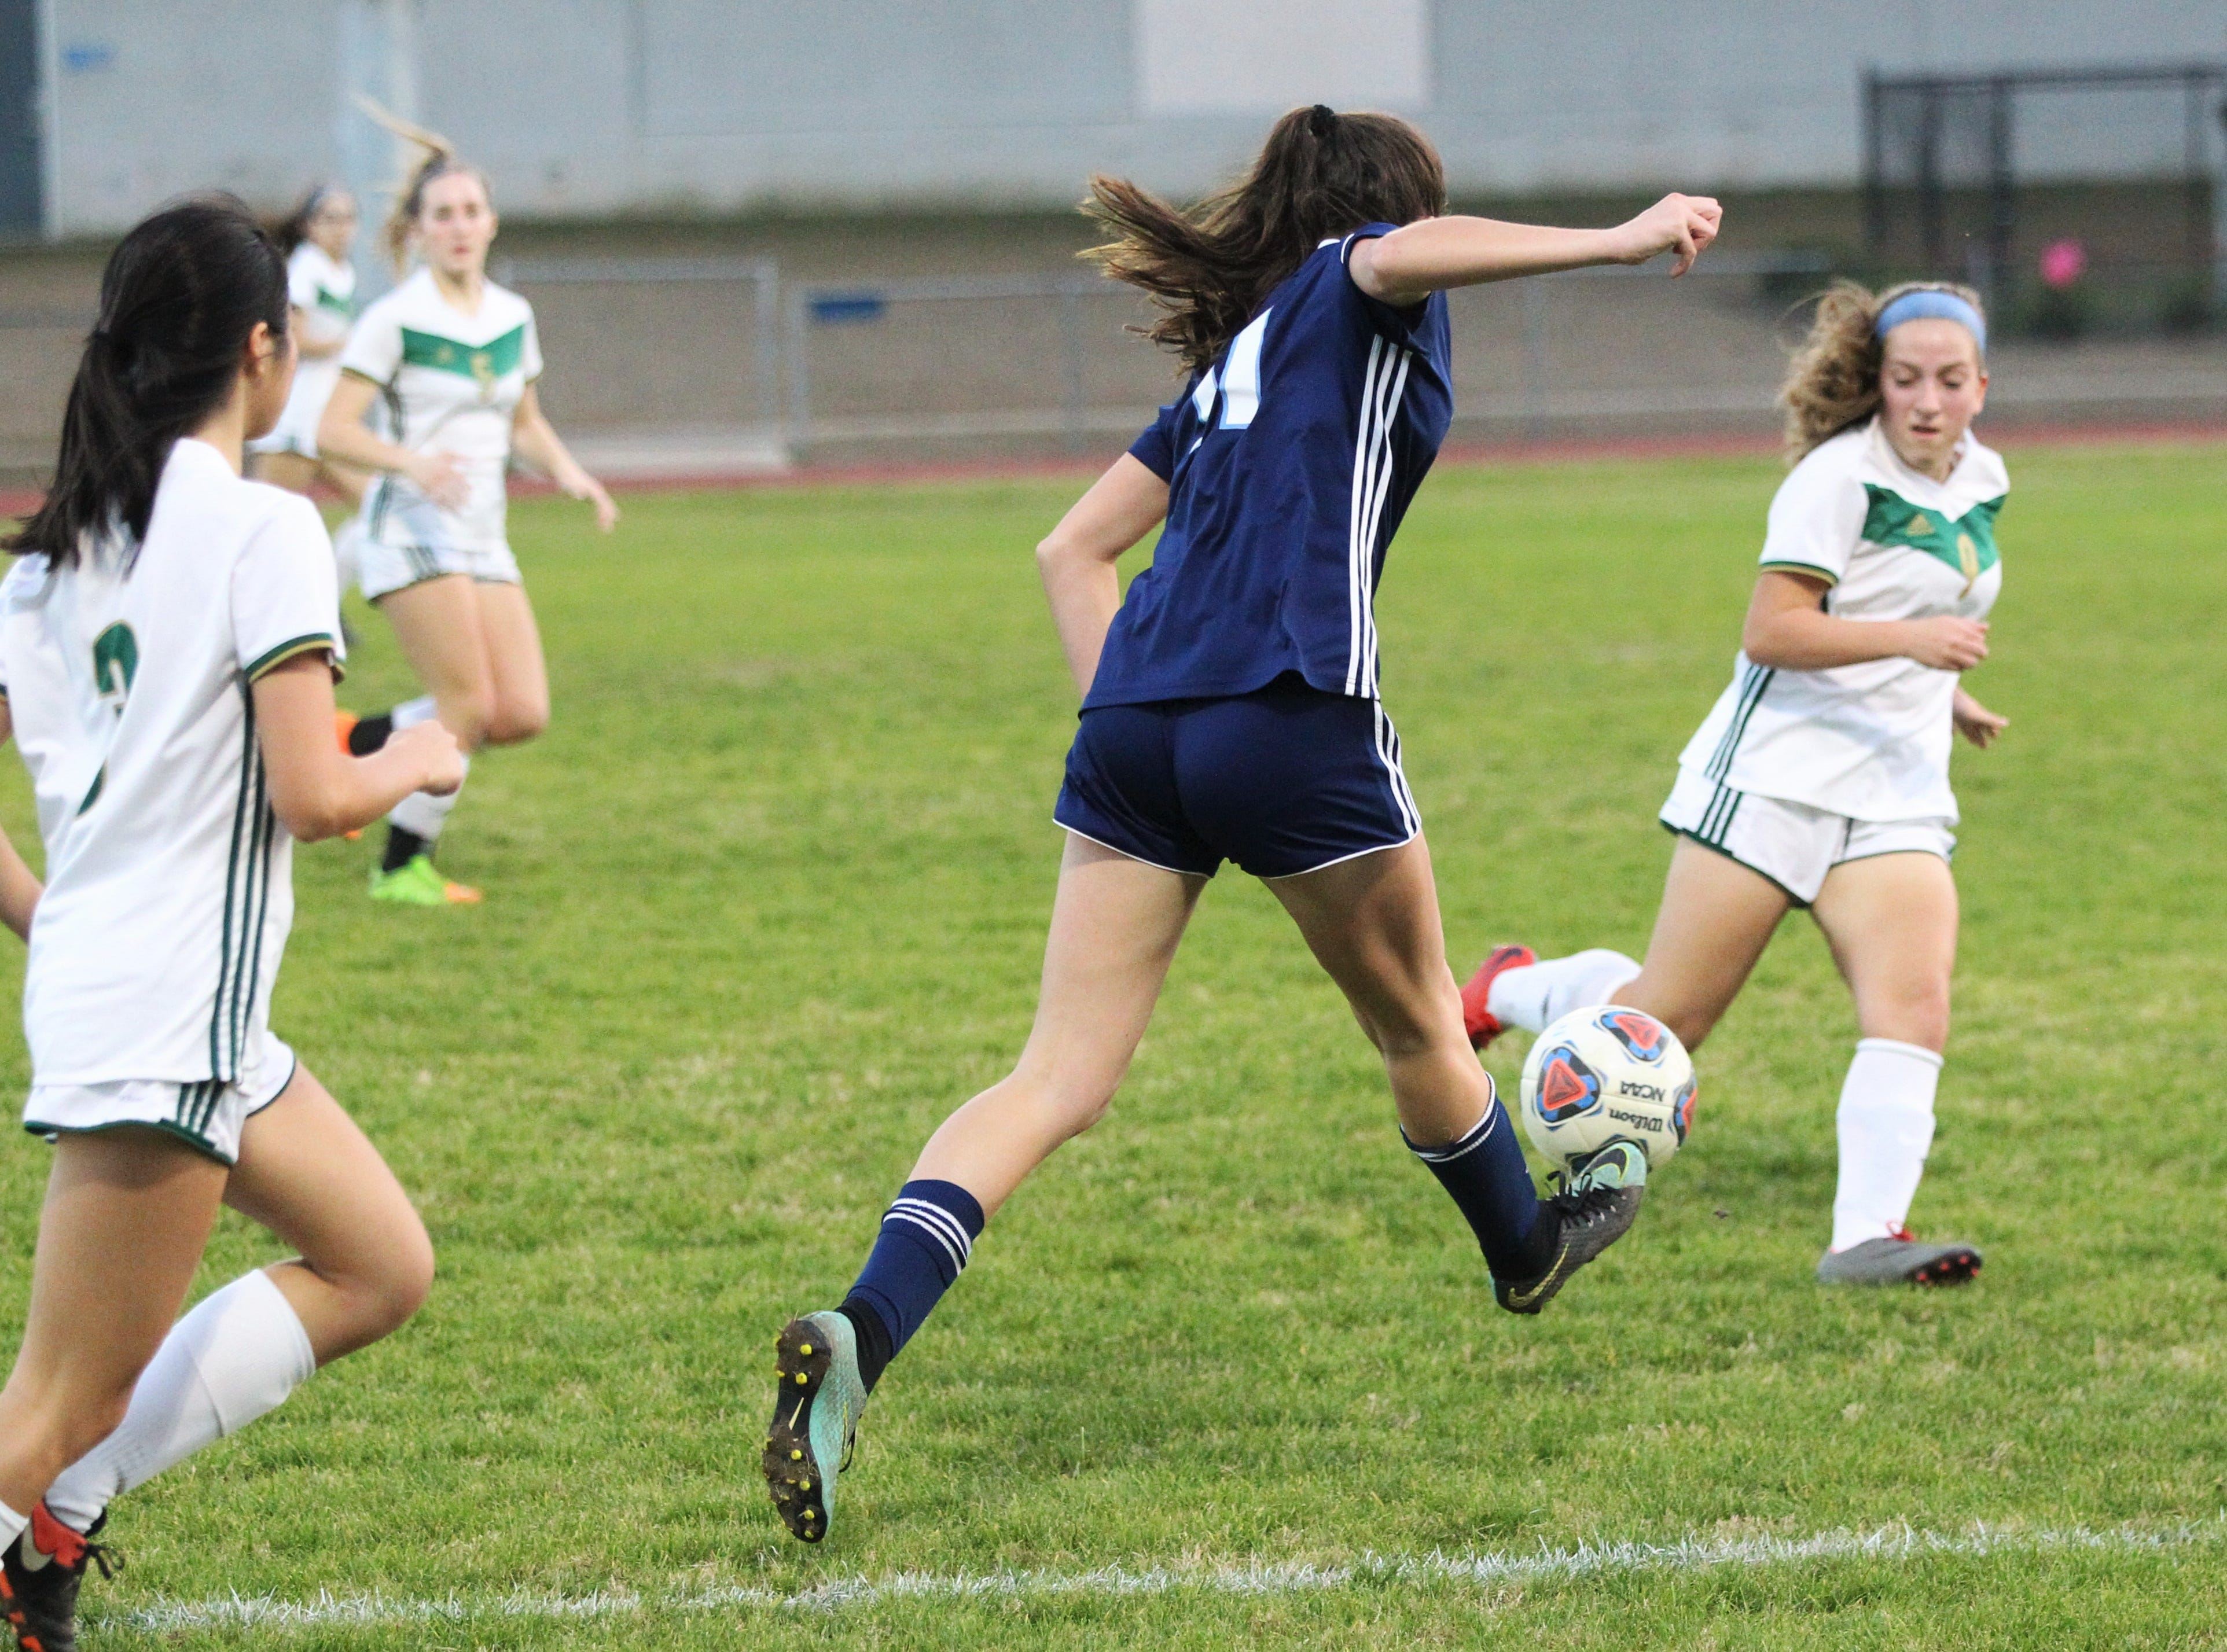 Maclay's Madison Perkins drills a cross as Maclay's girls soccer team beat St. Joseph Academy 4-0 in a Region 1-1A quarterfinal on Jan. 5, 2019.